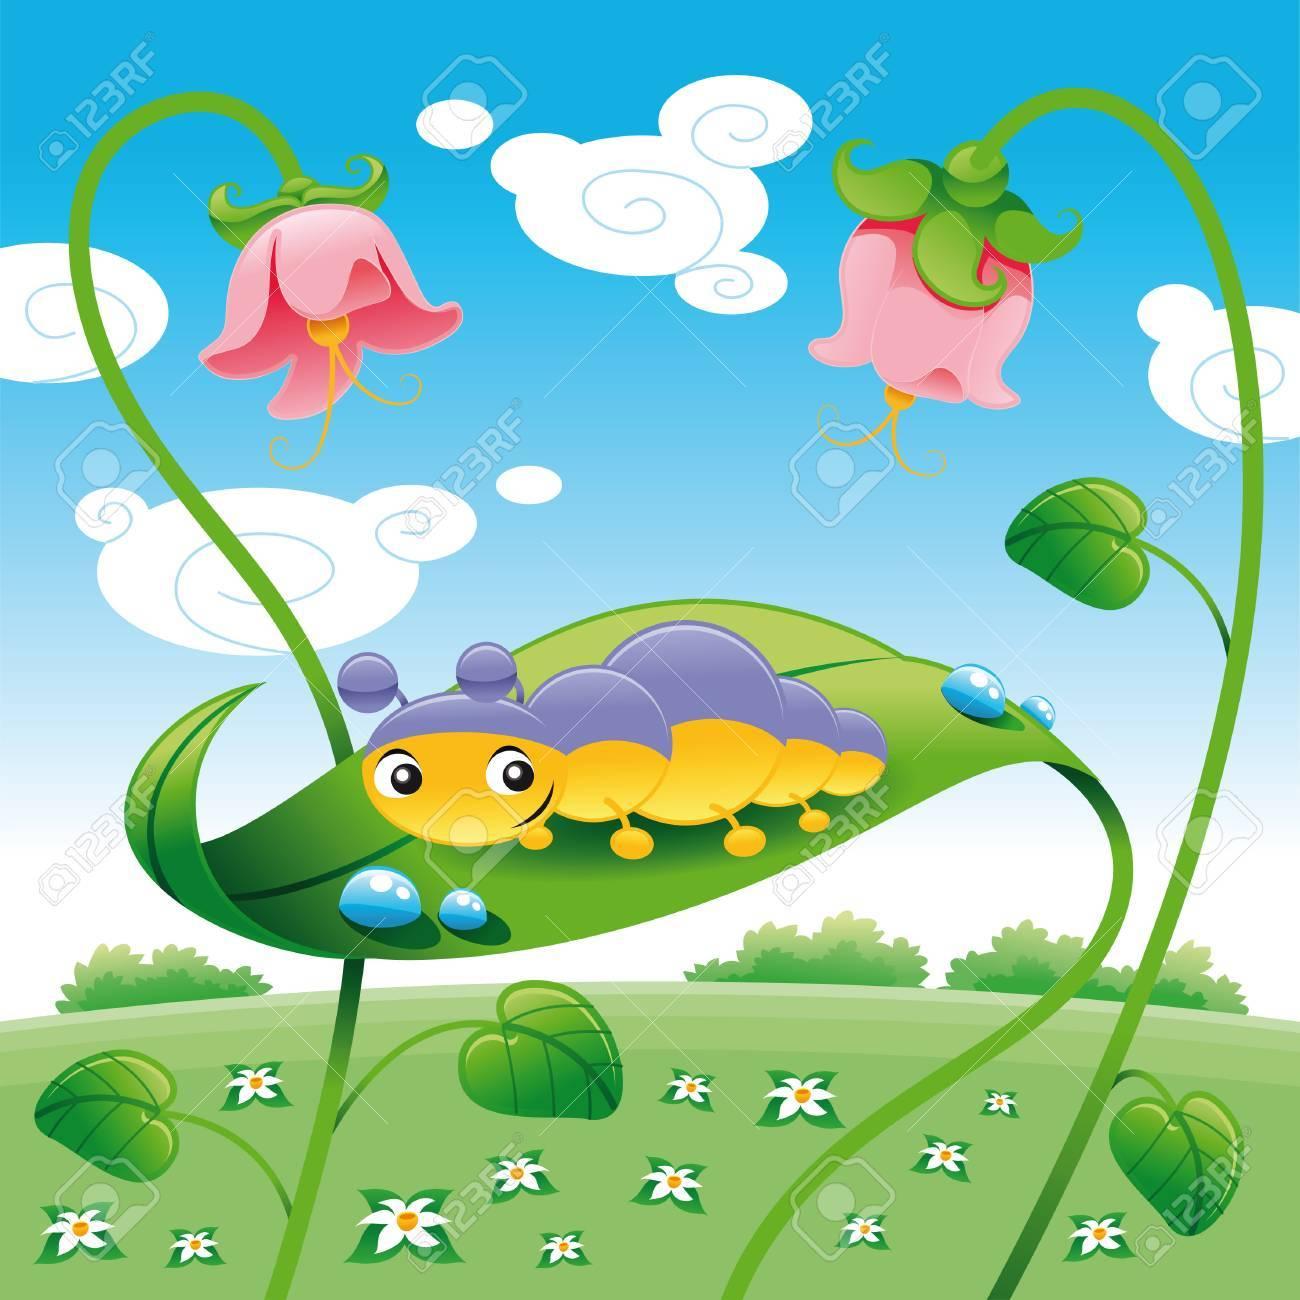 Grub on the leaf, vector and cartoon character Stock Vector - 5450512